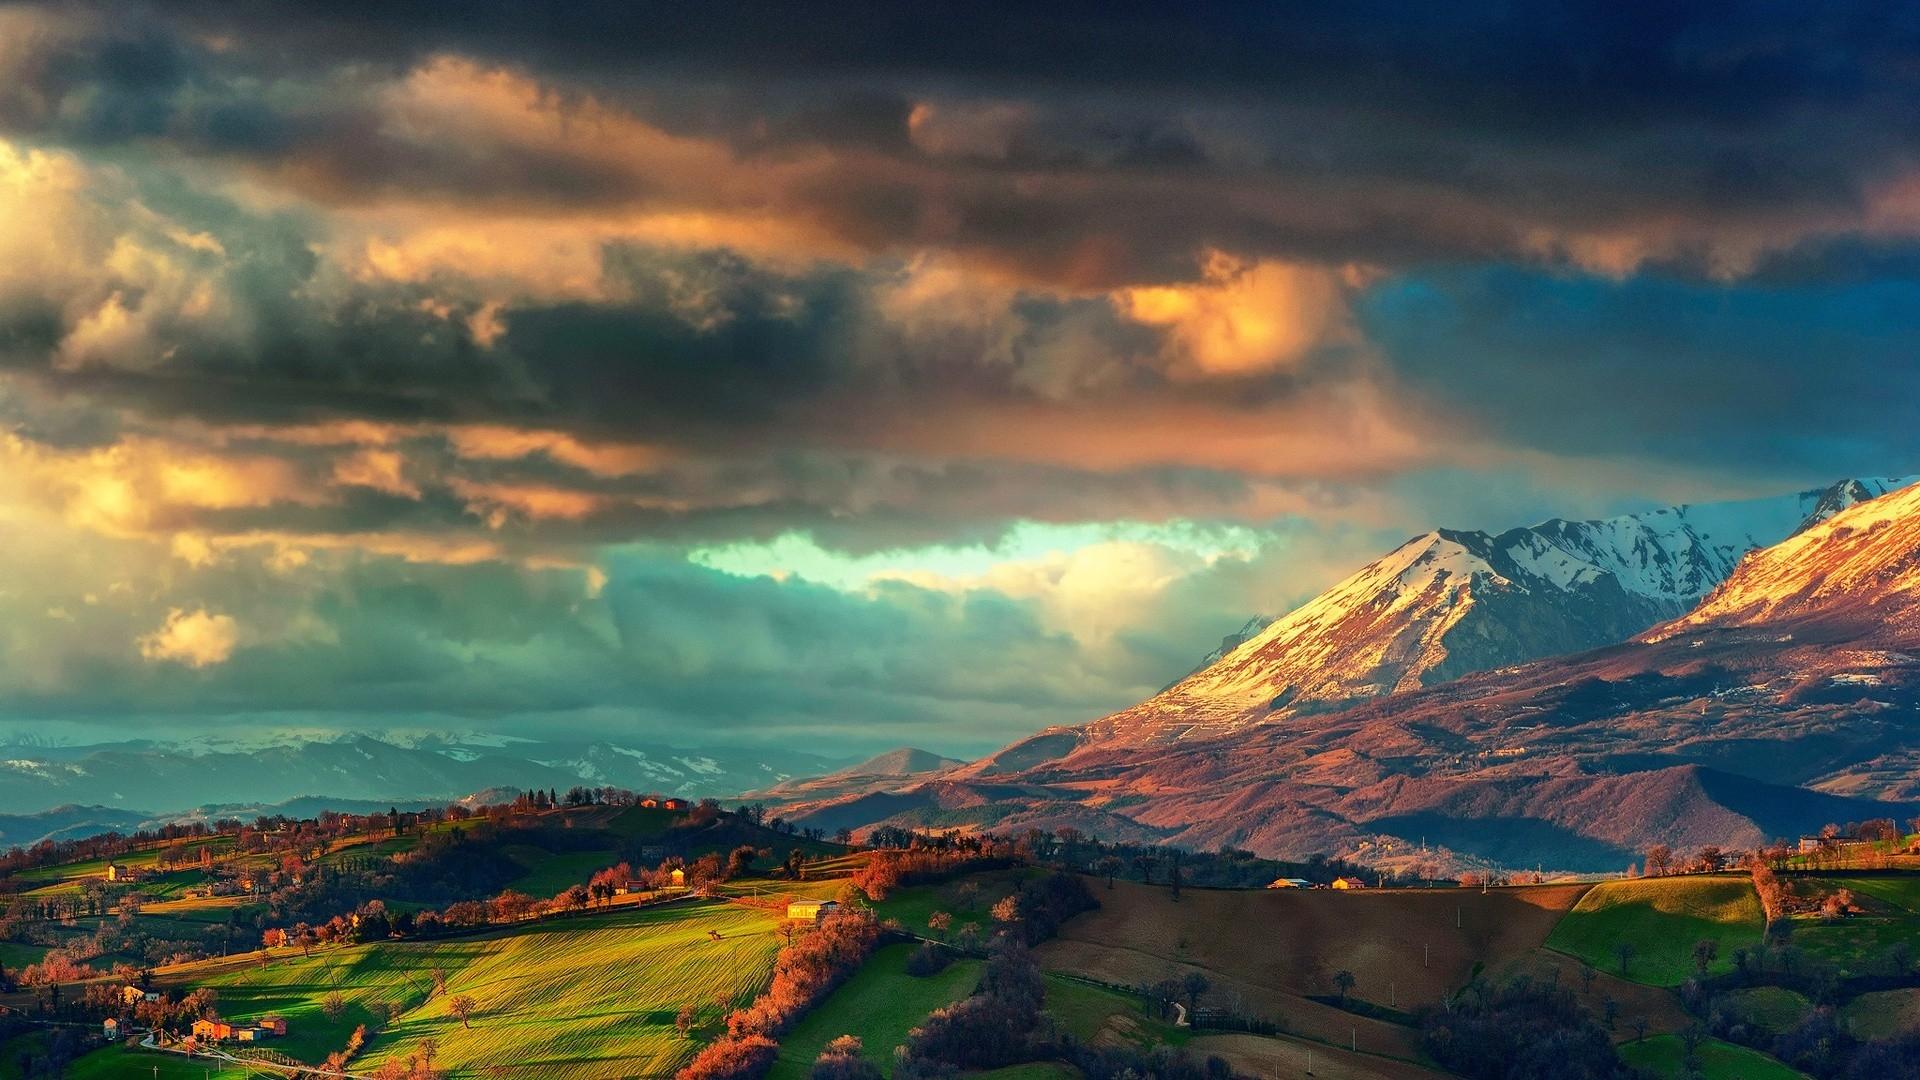 green mountain valley HD Desktop Wallpaper HD Desktop Wallpaper 1920x1080